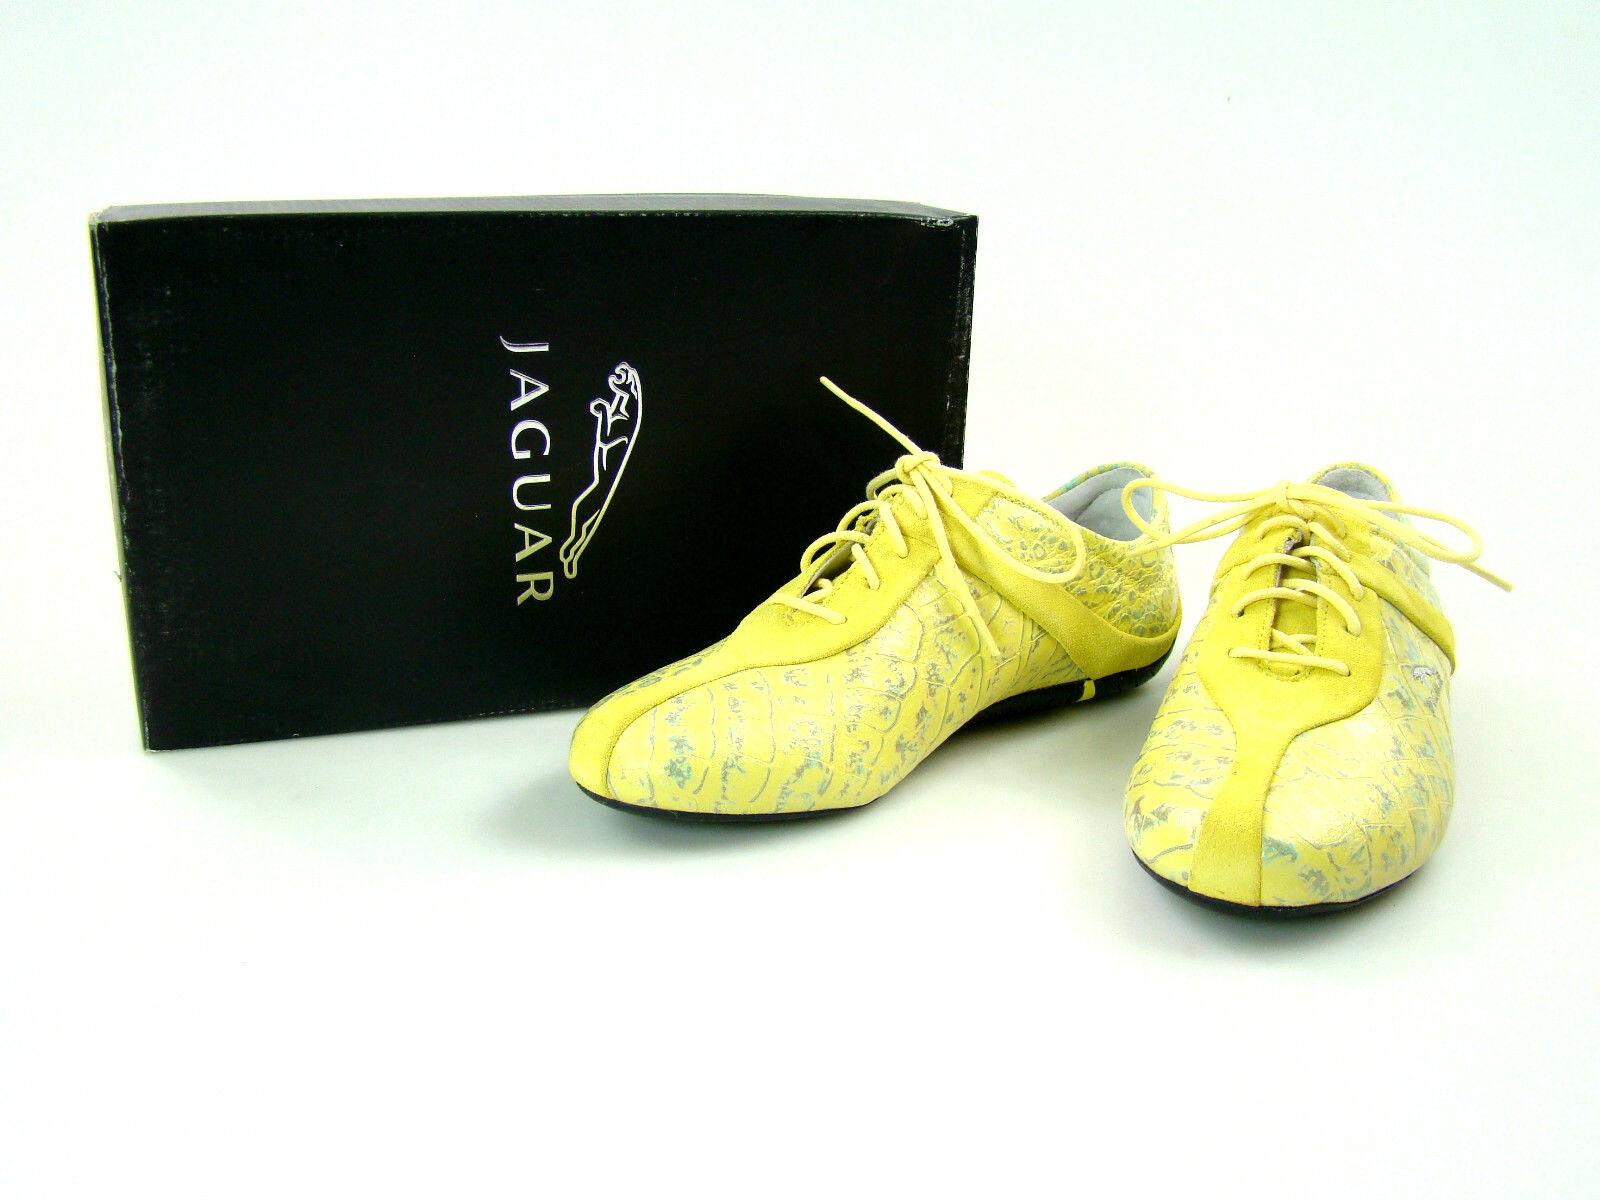 JAGUAR Damen Halbschuhe Sneaker 37 NEU Leder Halbschuhe Damen Schuhe sportlich gelb 4944 e659c9